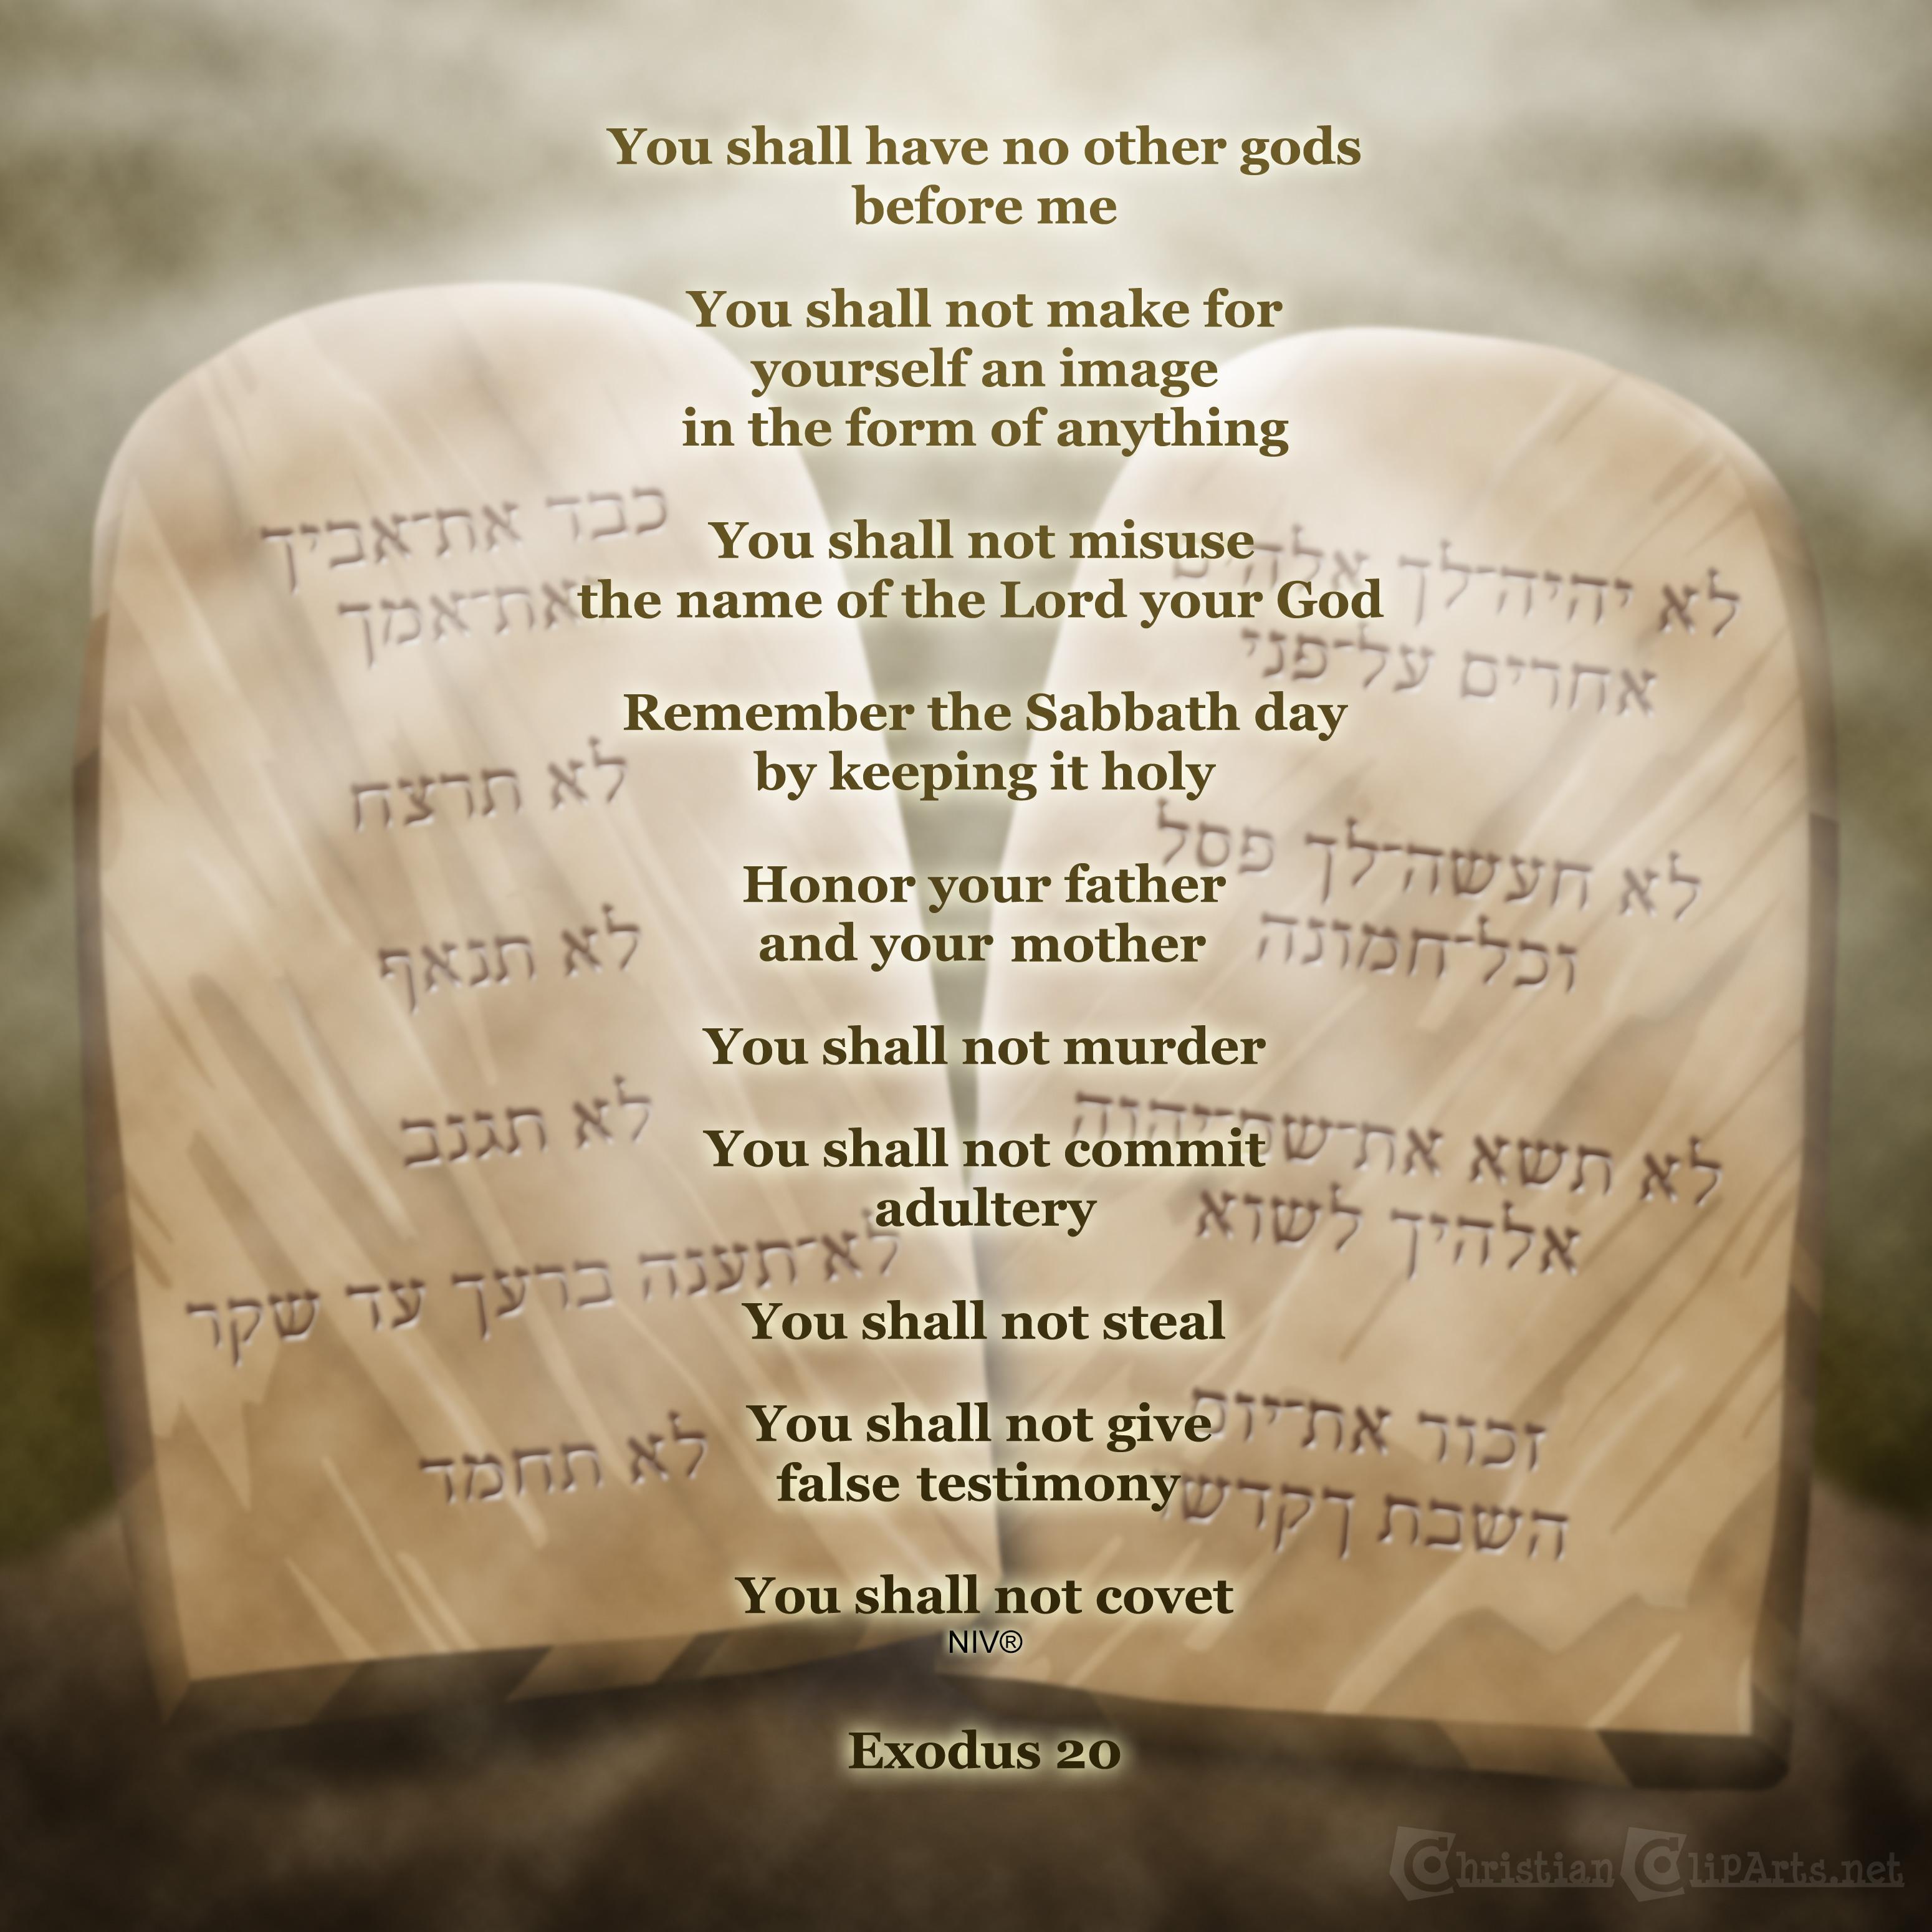 Ten commandments clipart niv. Christian cliparts net the